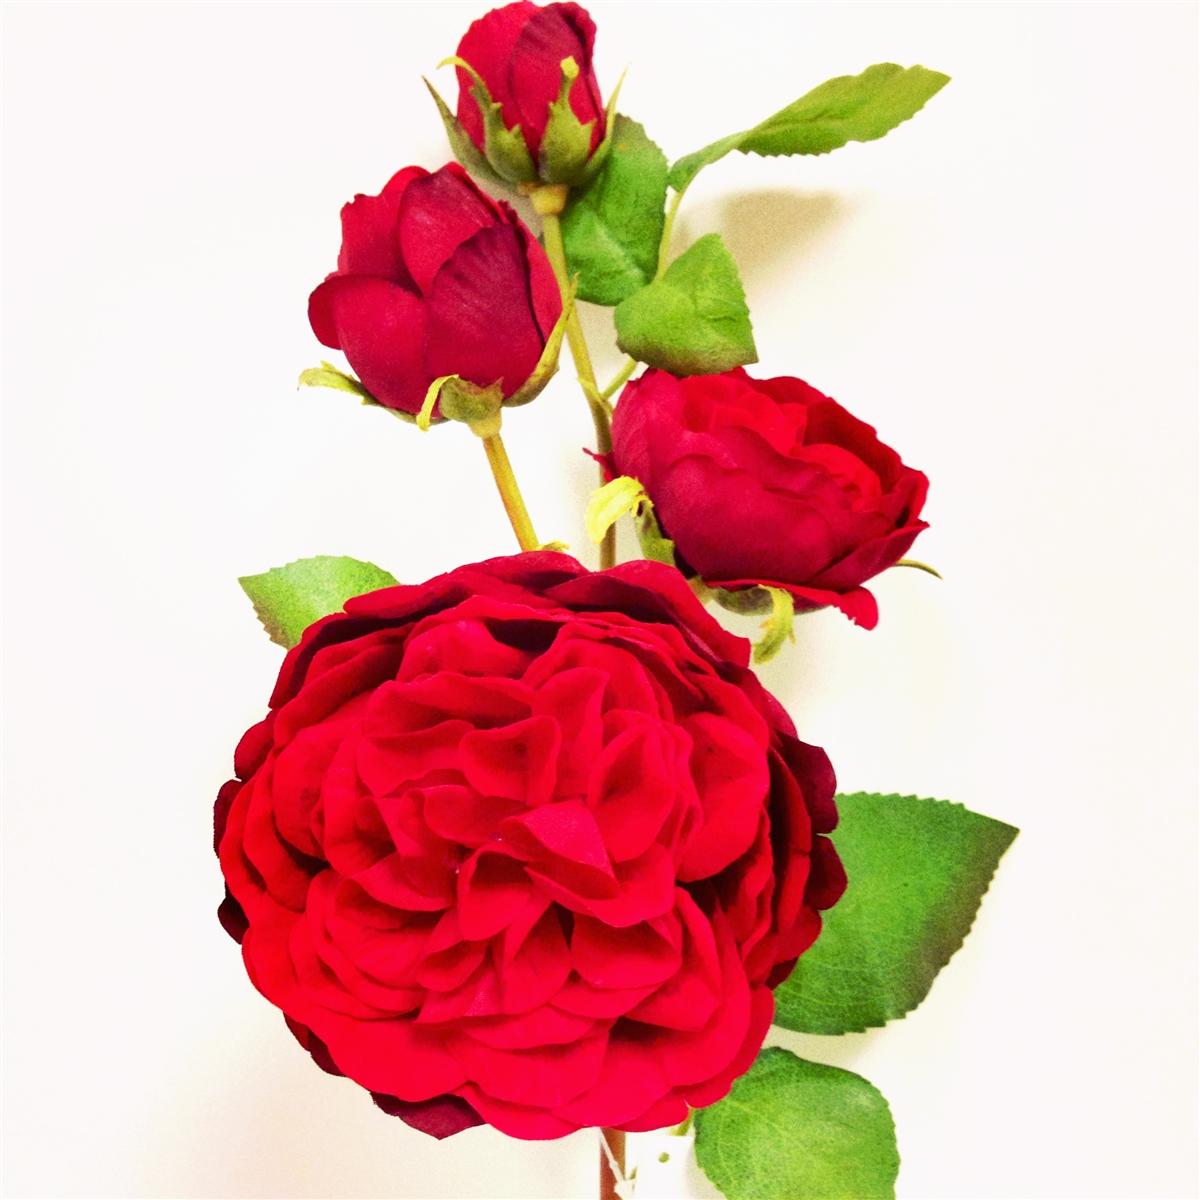 Red Rose Silk Flower Spray At Laus Flowers Inc